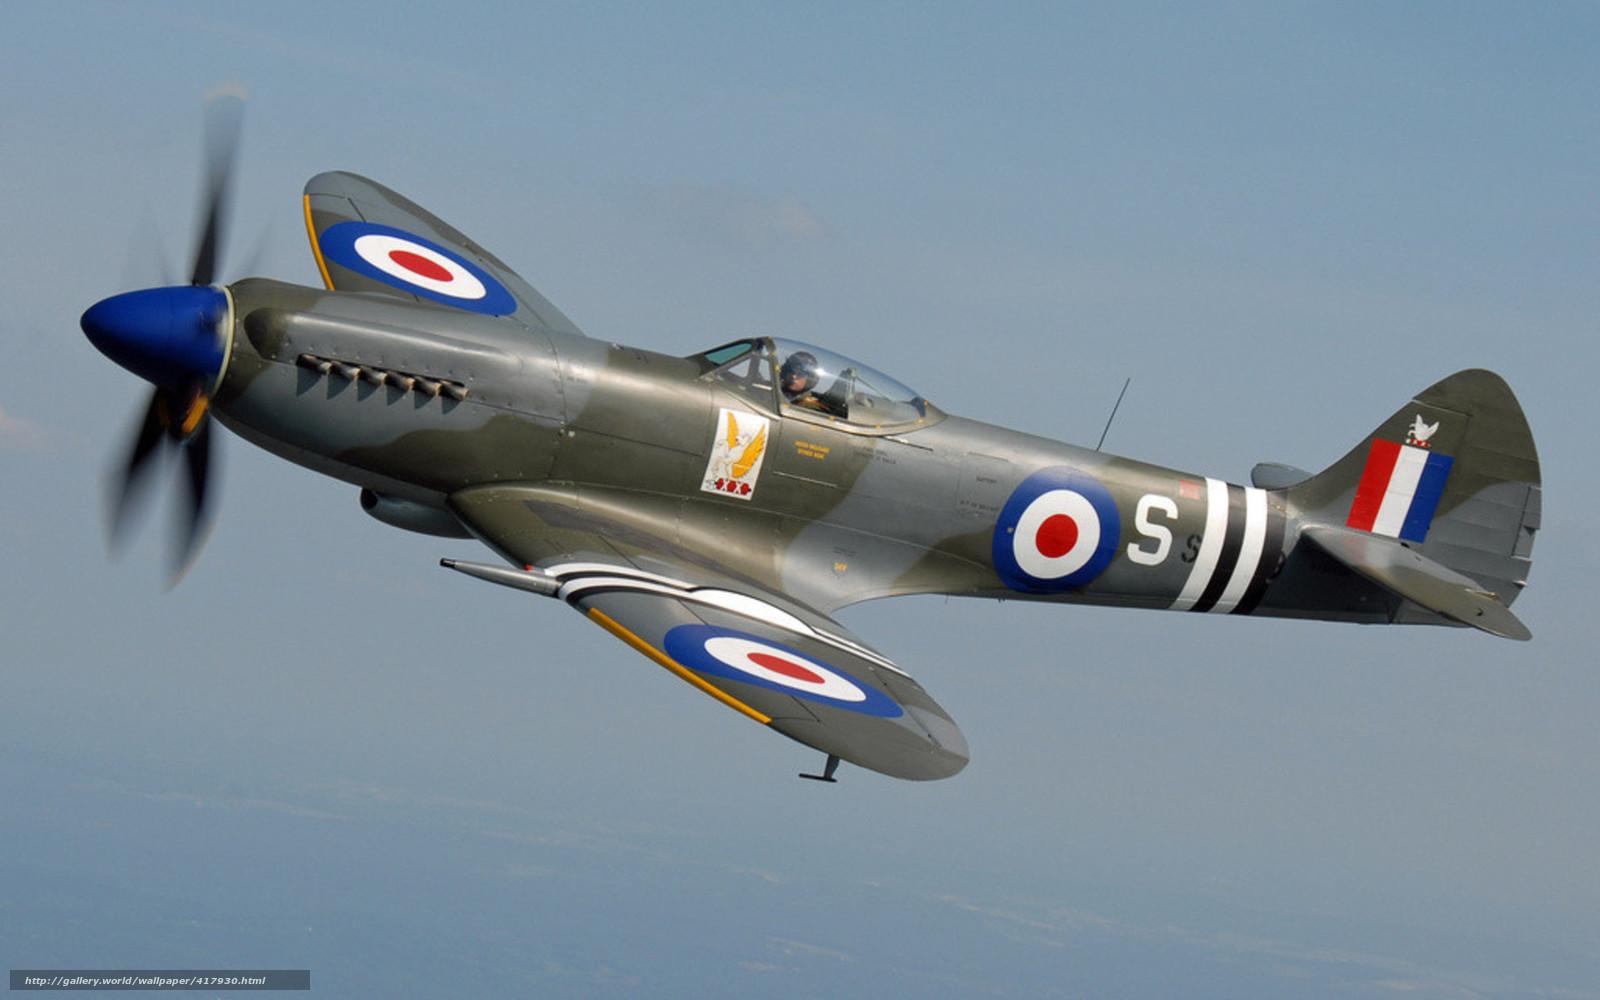 Spitfire Wallpaper Related Keywords Suggestions   Spitfire Wallpaper 1600x1000